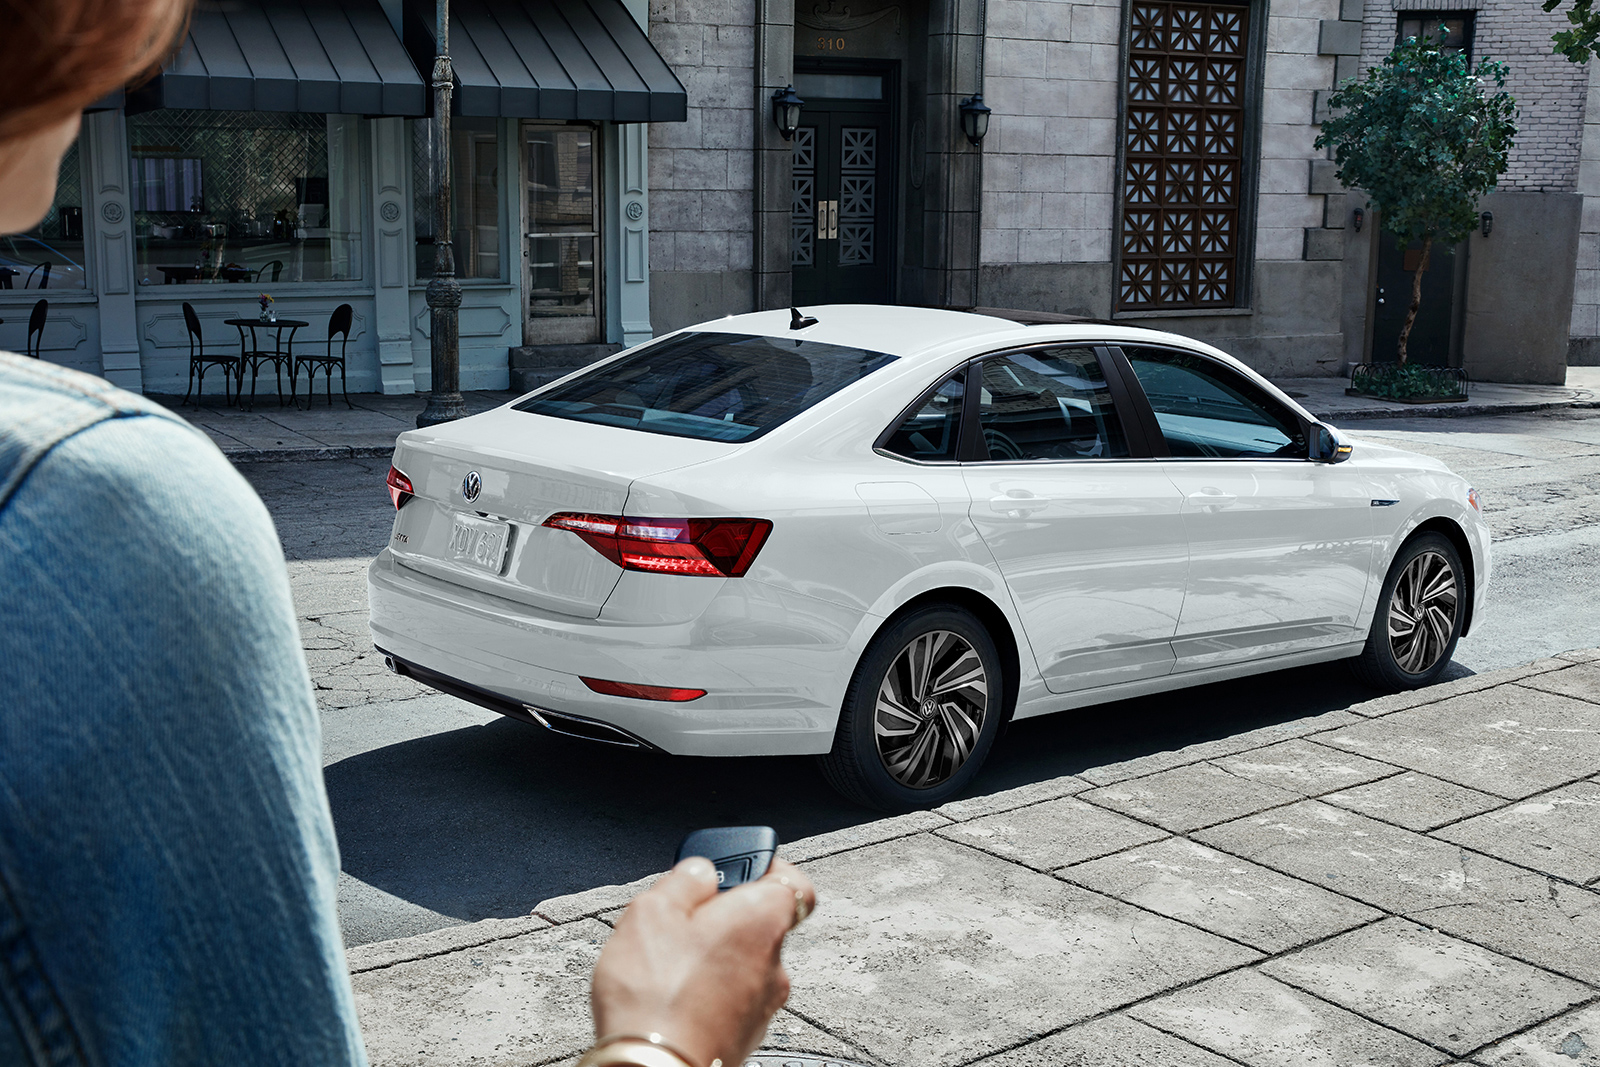 2020 Volkswagen Jetta vs 2020 Subaru Impreza near Washington, DC